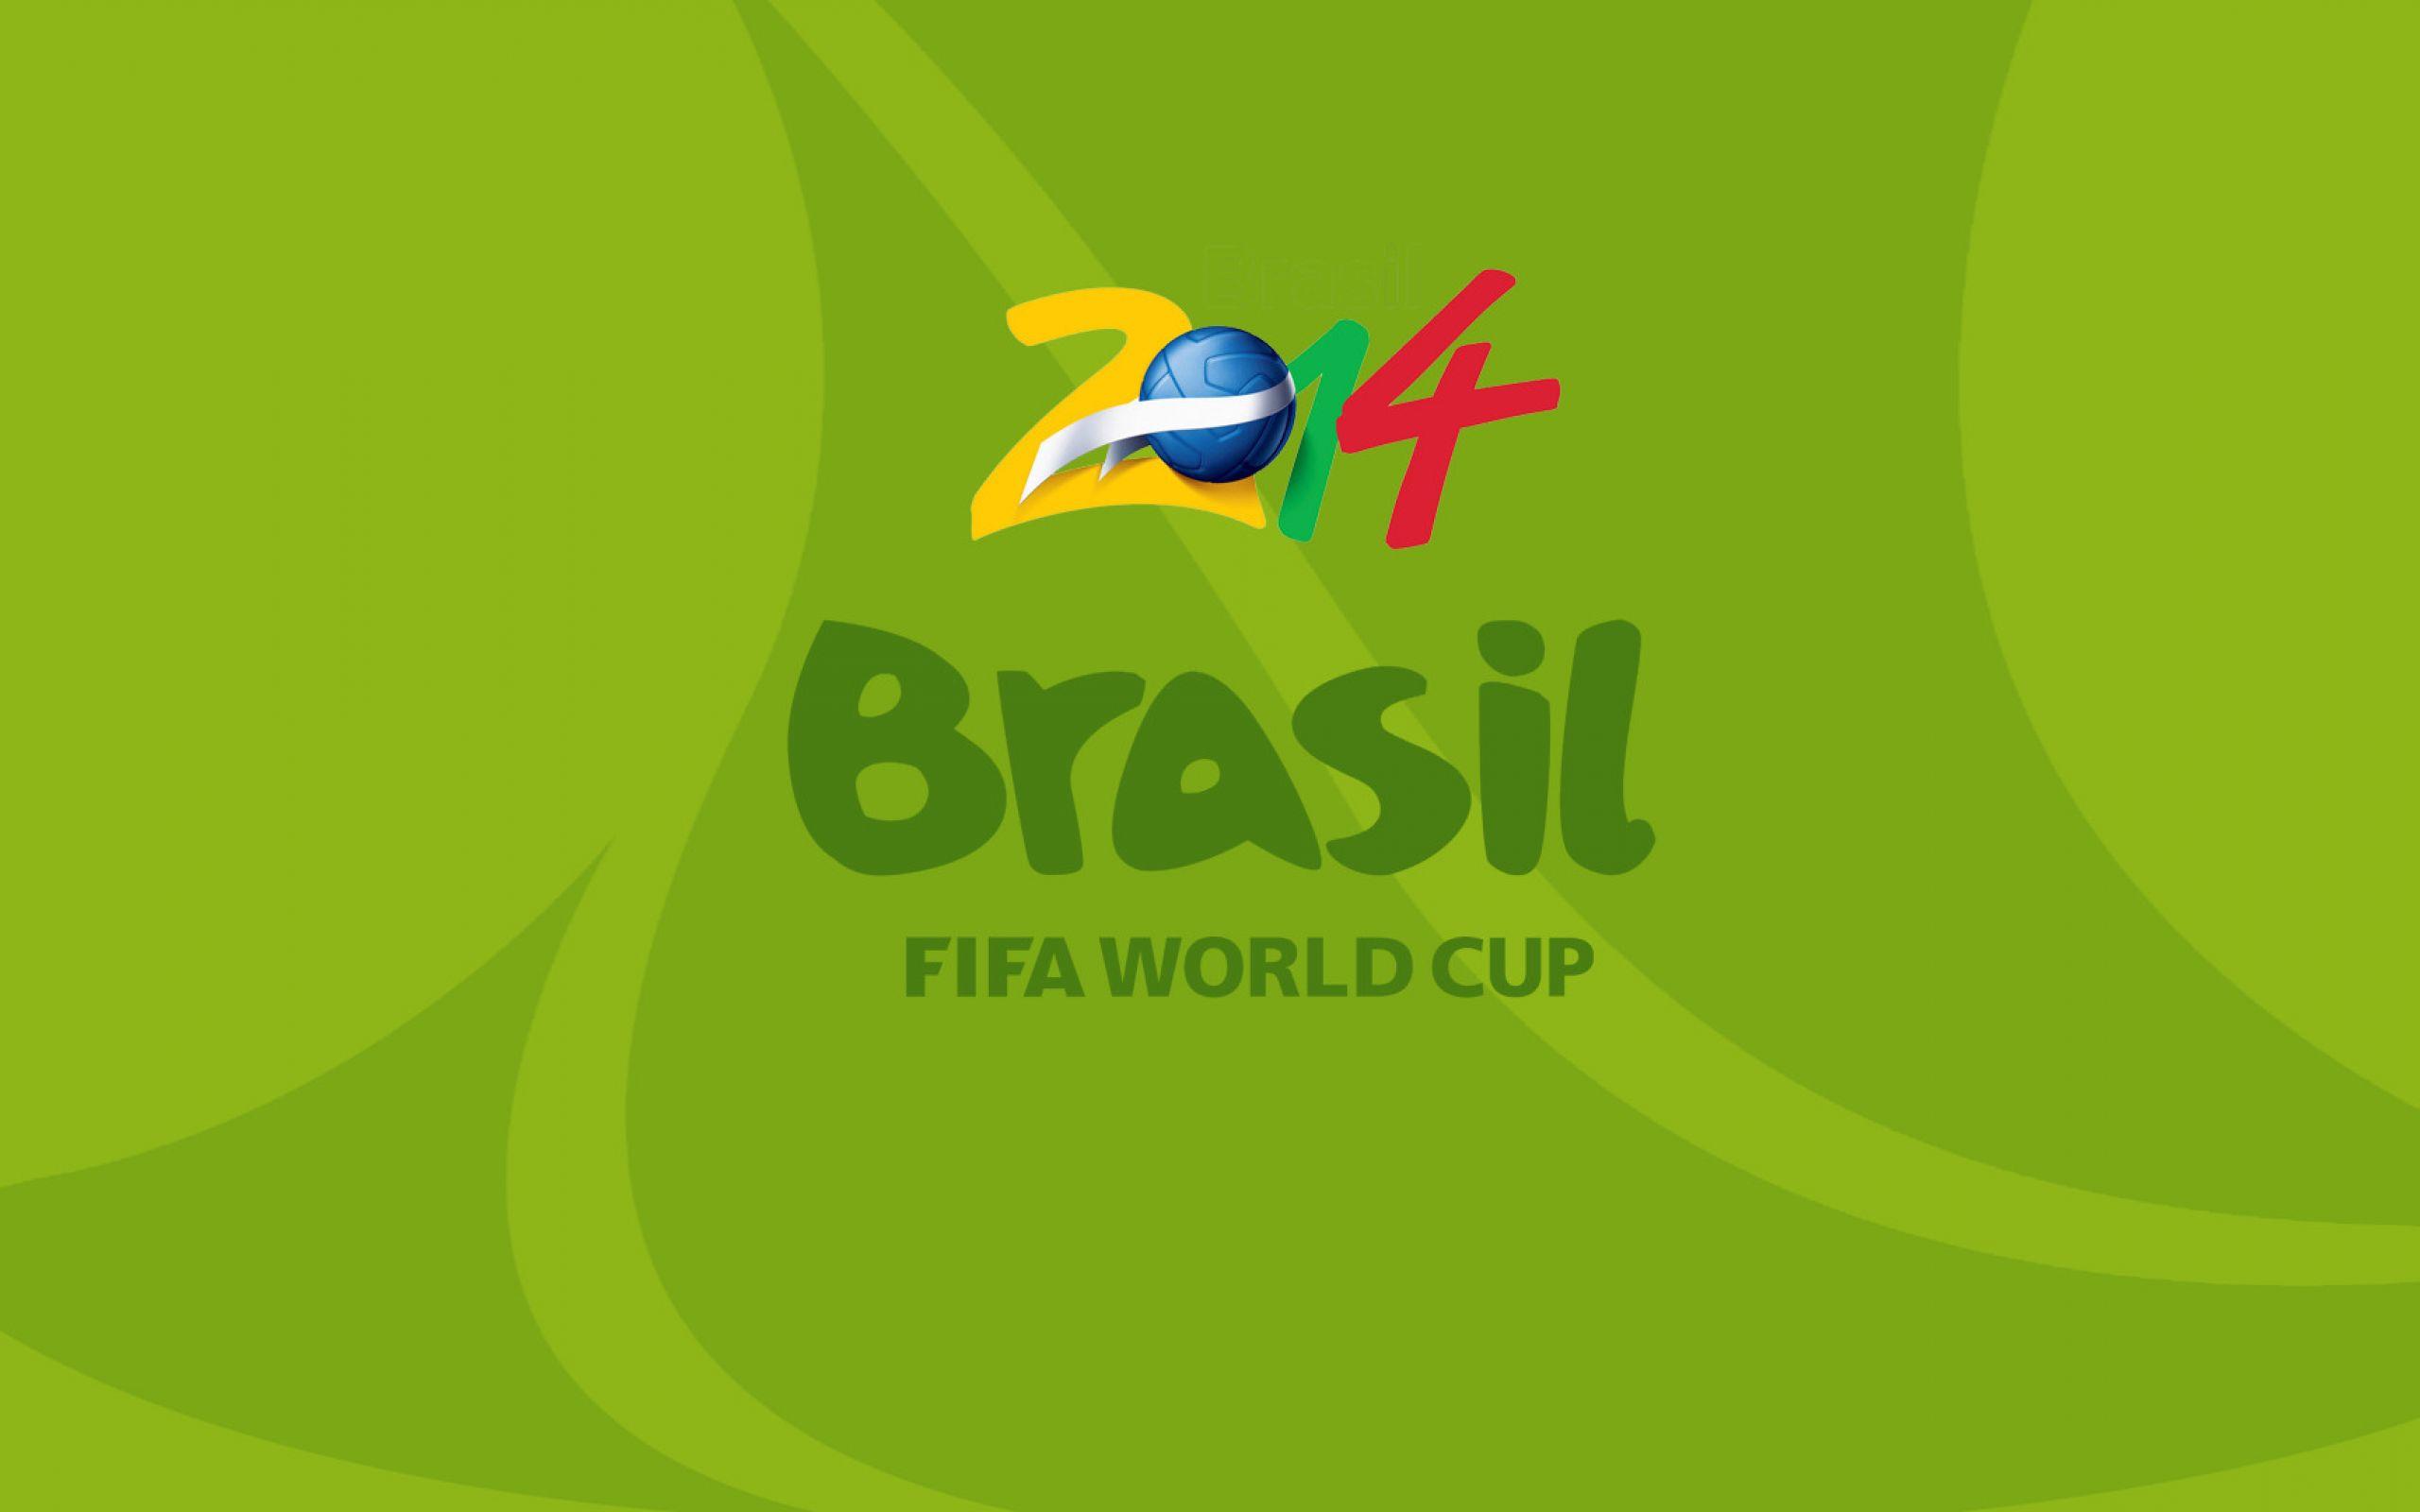 турнирная таблица бразилия 2014